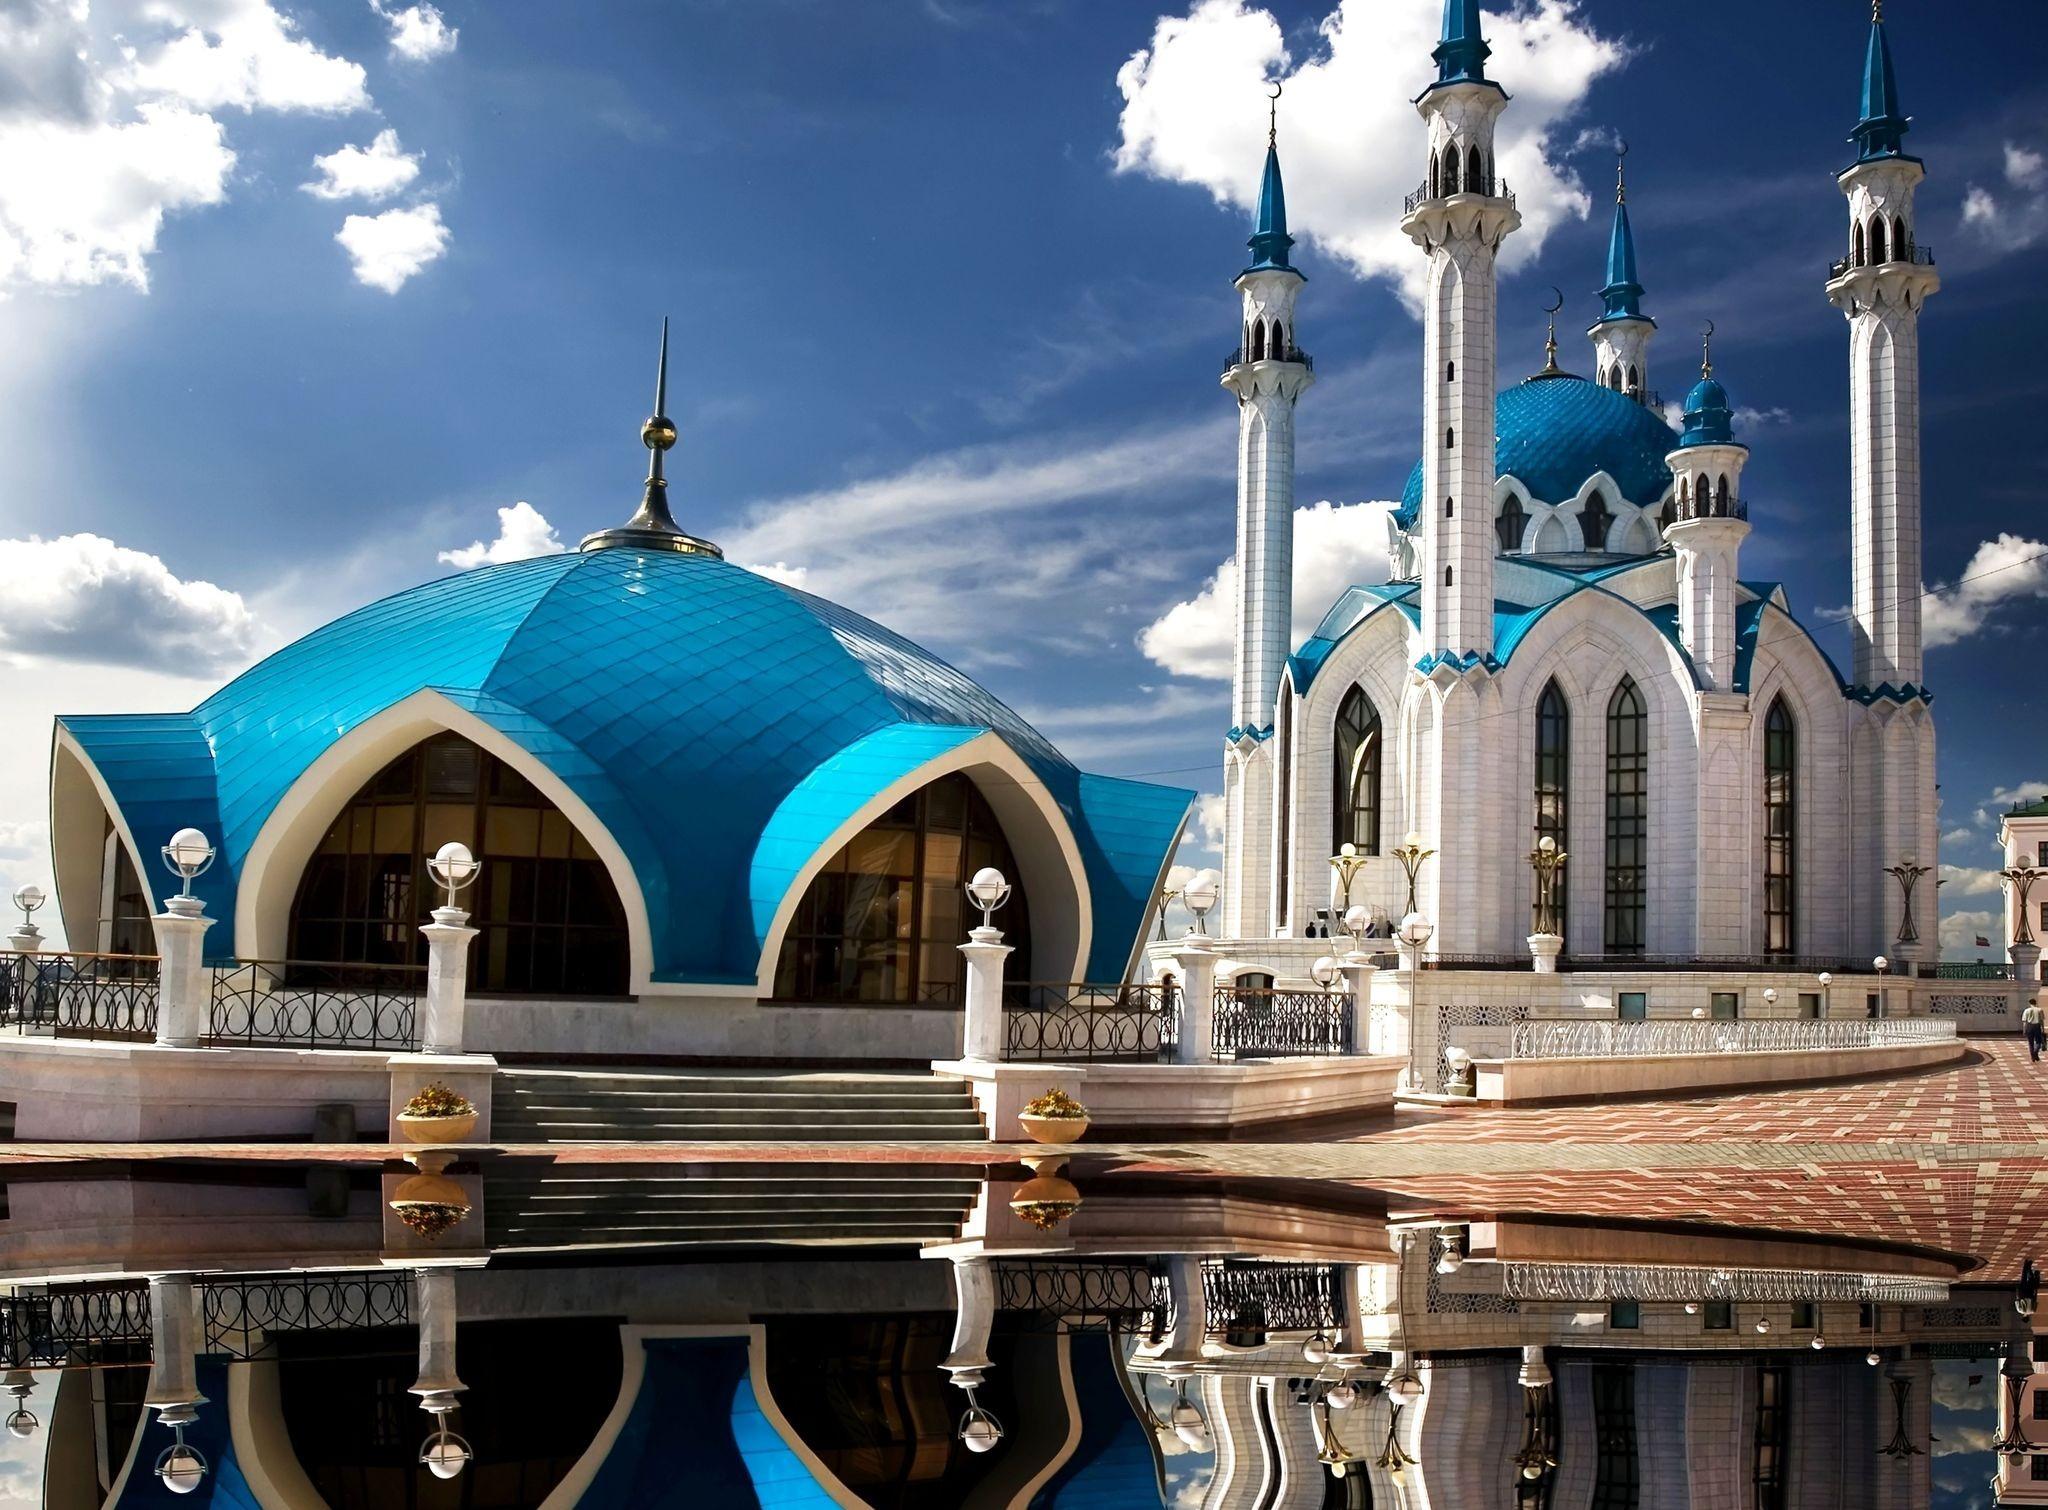 qolsharif mosque kazan russia full hd wallpaper and background